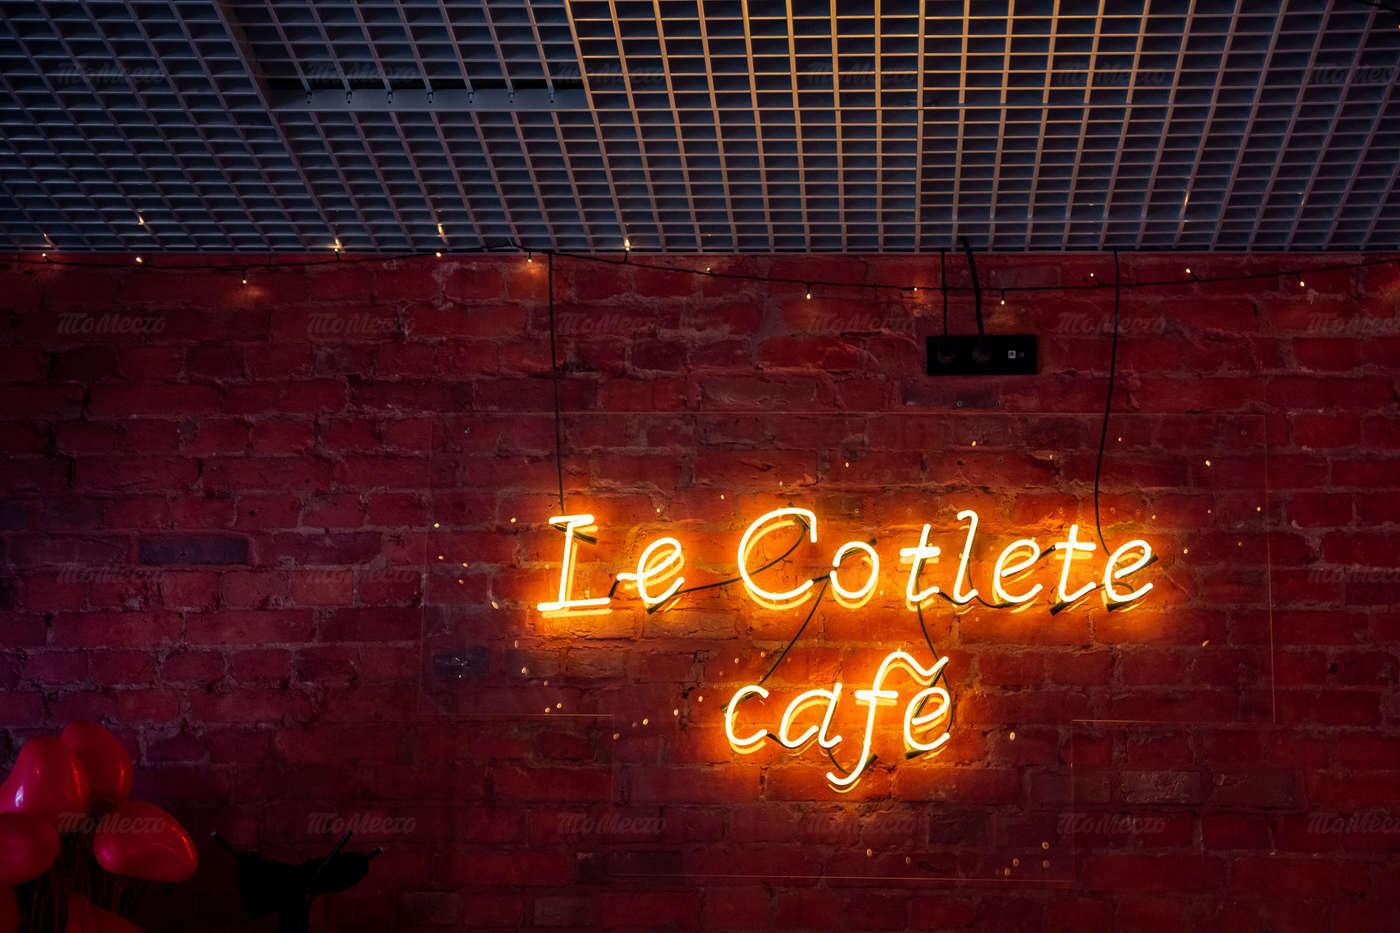 Кафе Le Cotlete Cafe на Чайковского фото 9